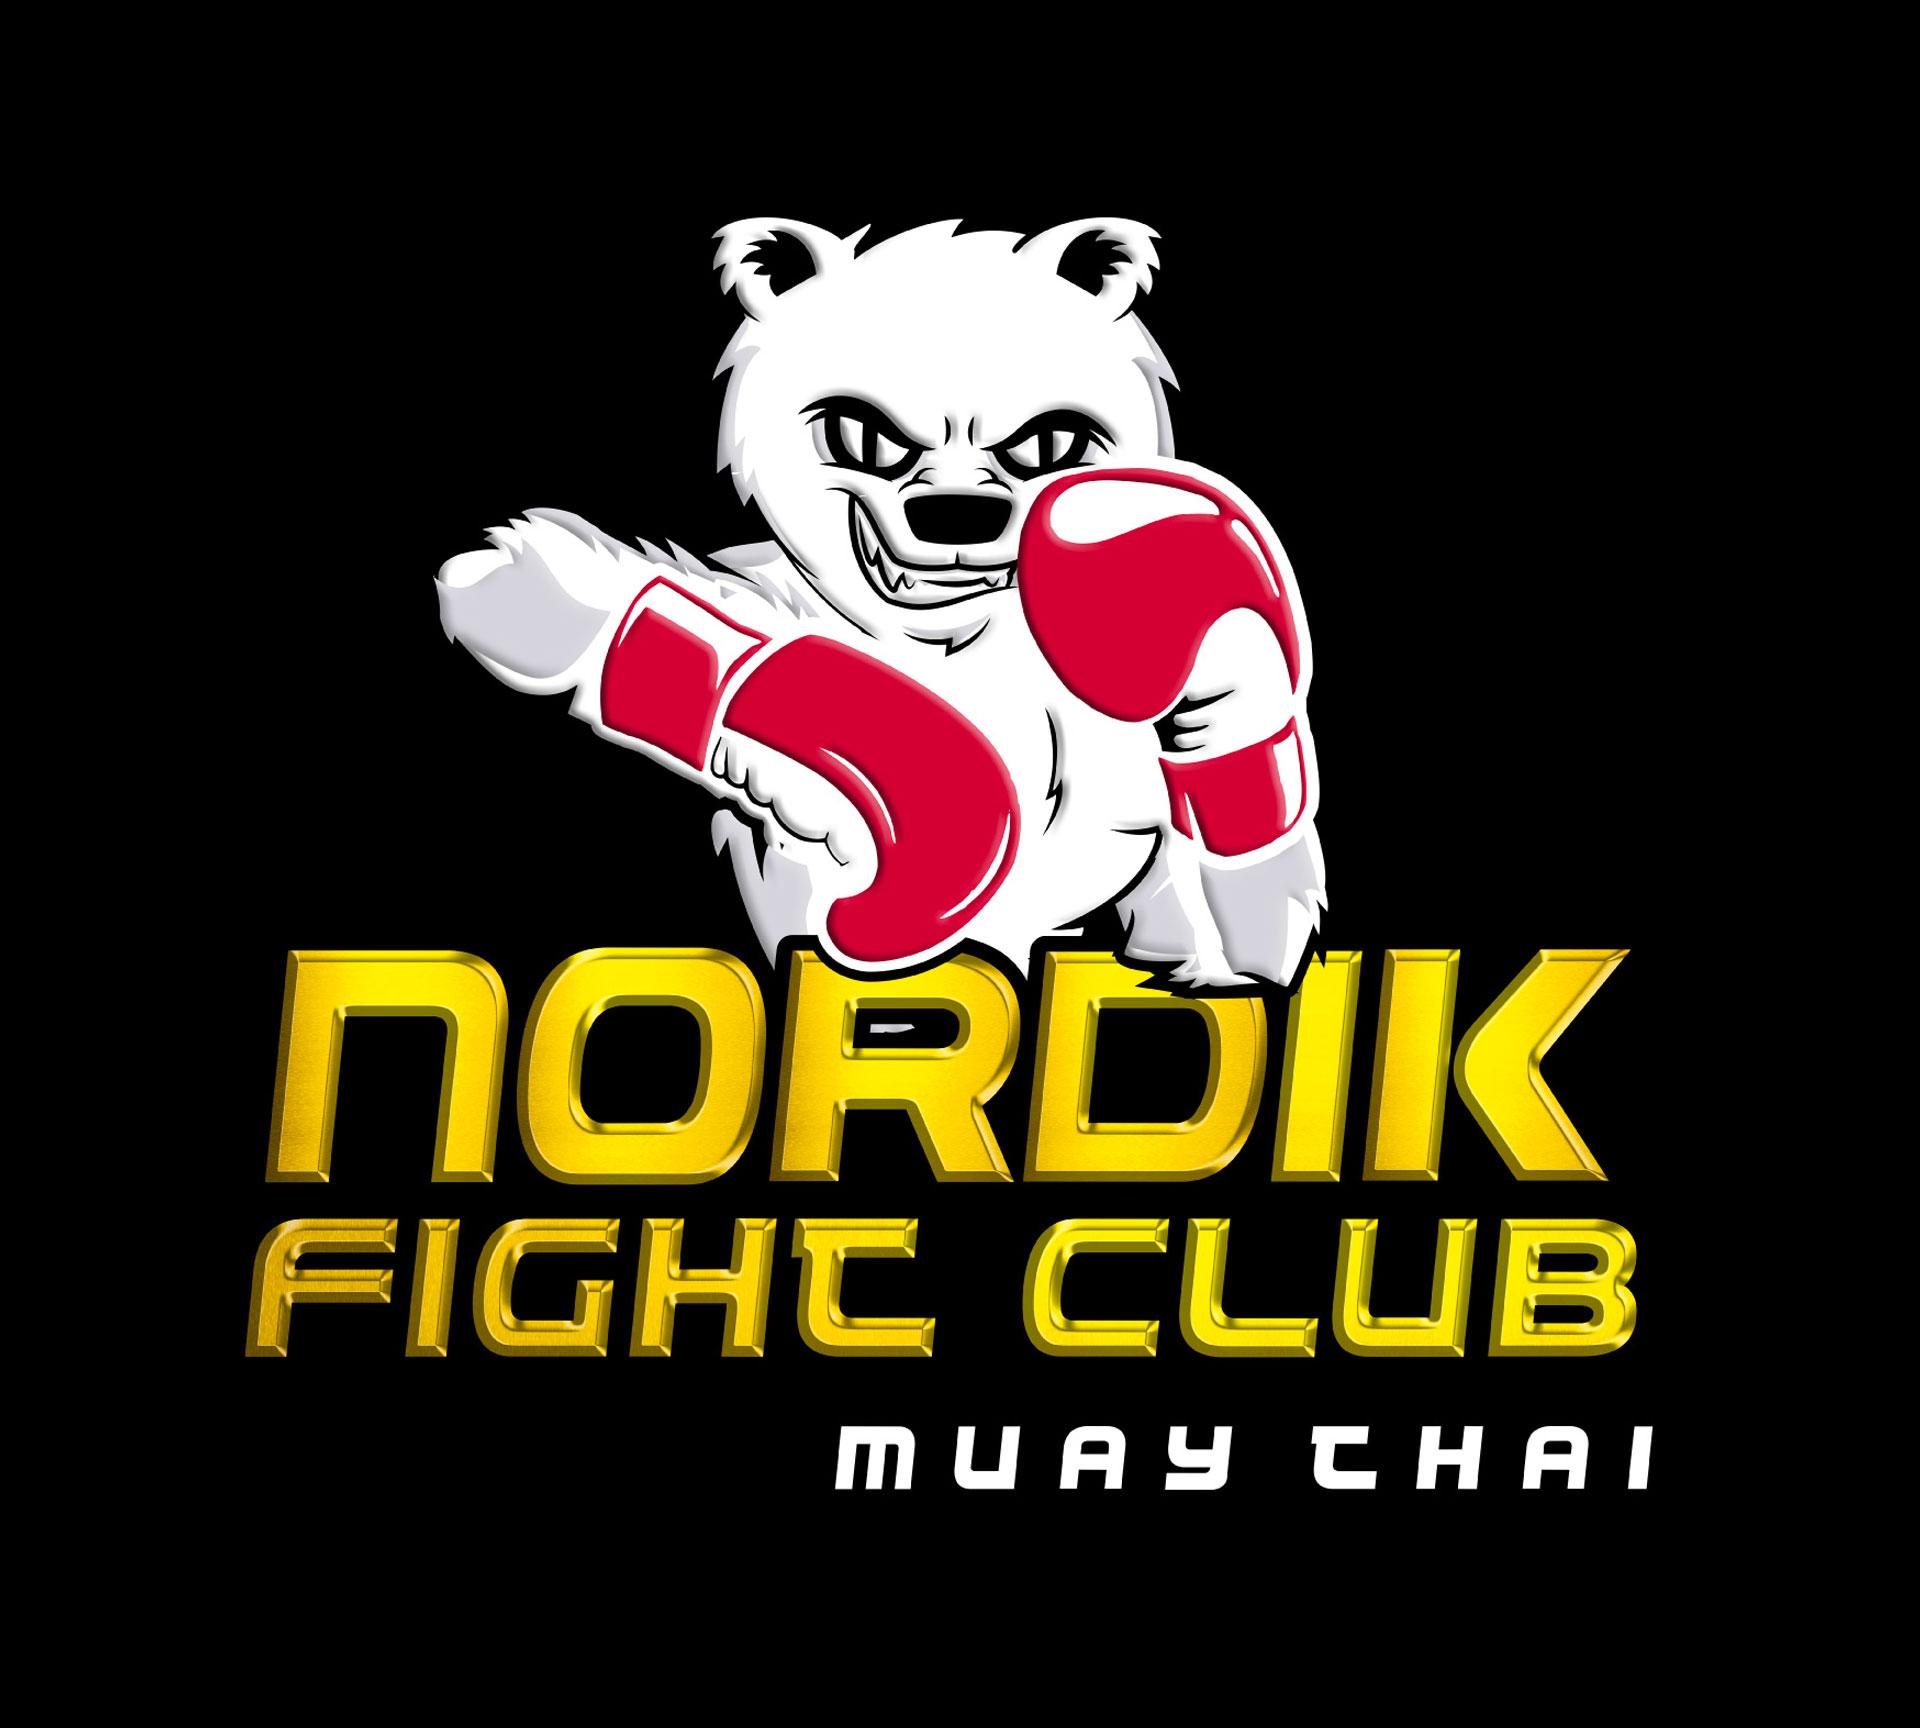 Nordik Fight Club Muay Thai